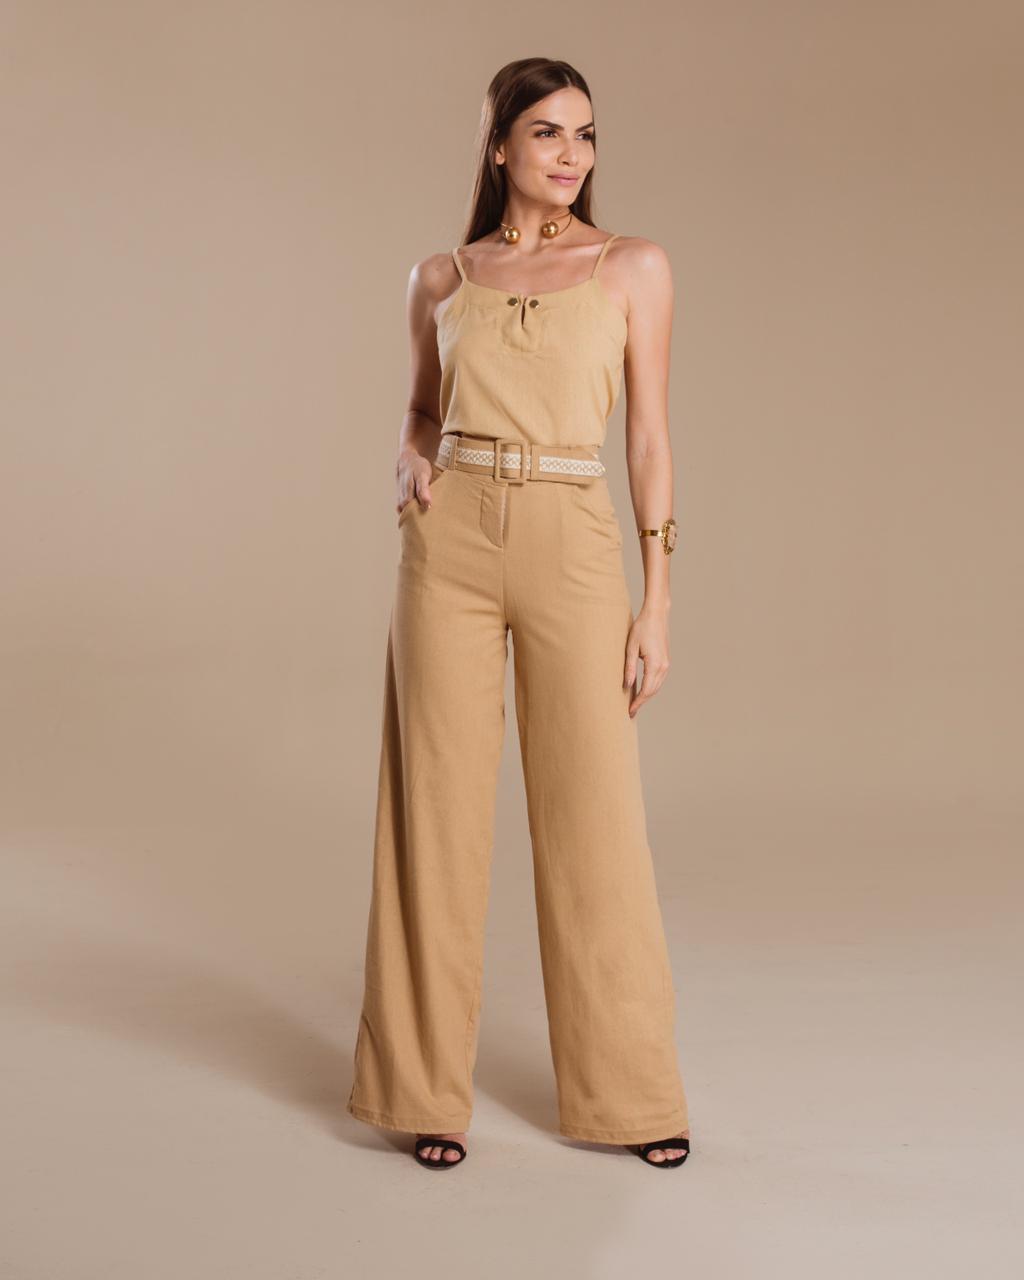 2610d7aad Calça Pantalona de Linho Bege com Cinto - VANKOKE - Moda Feminina ...